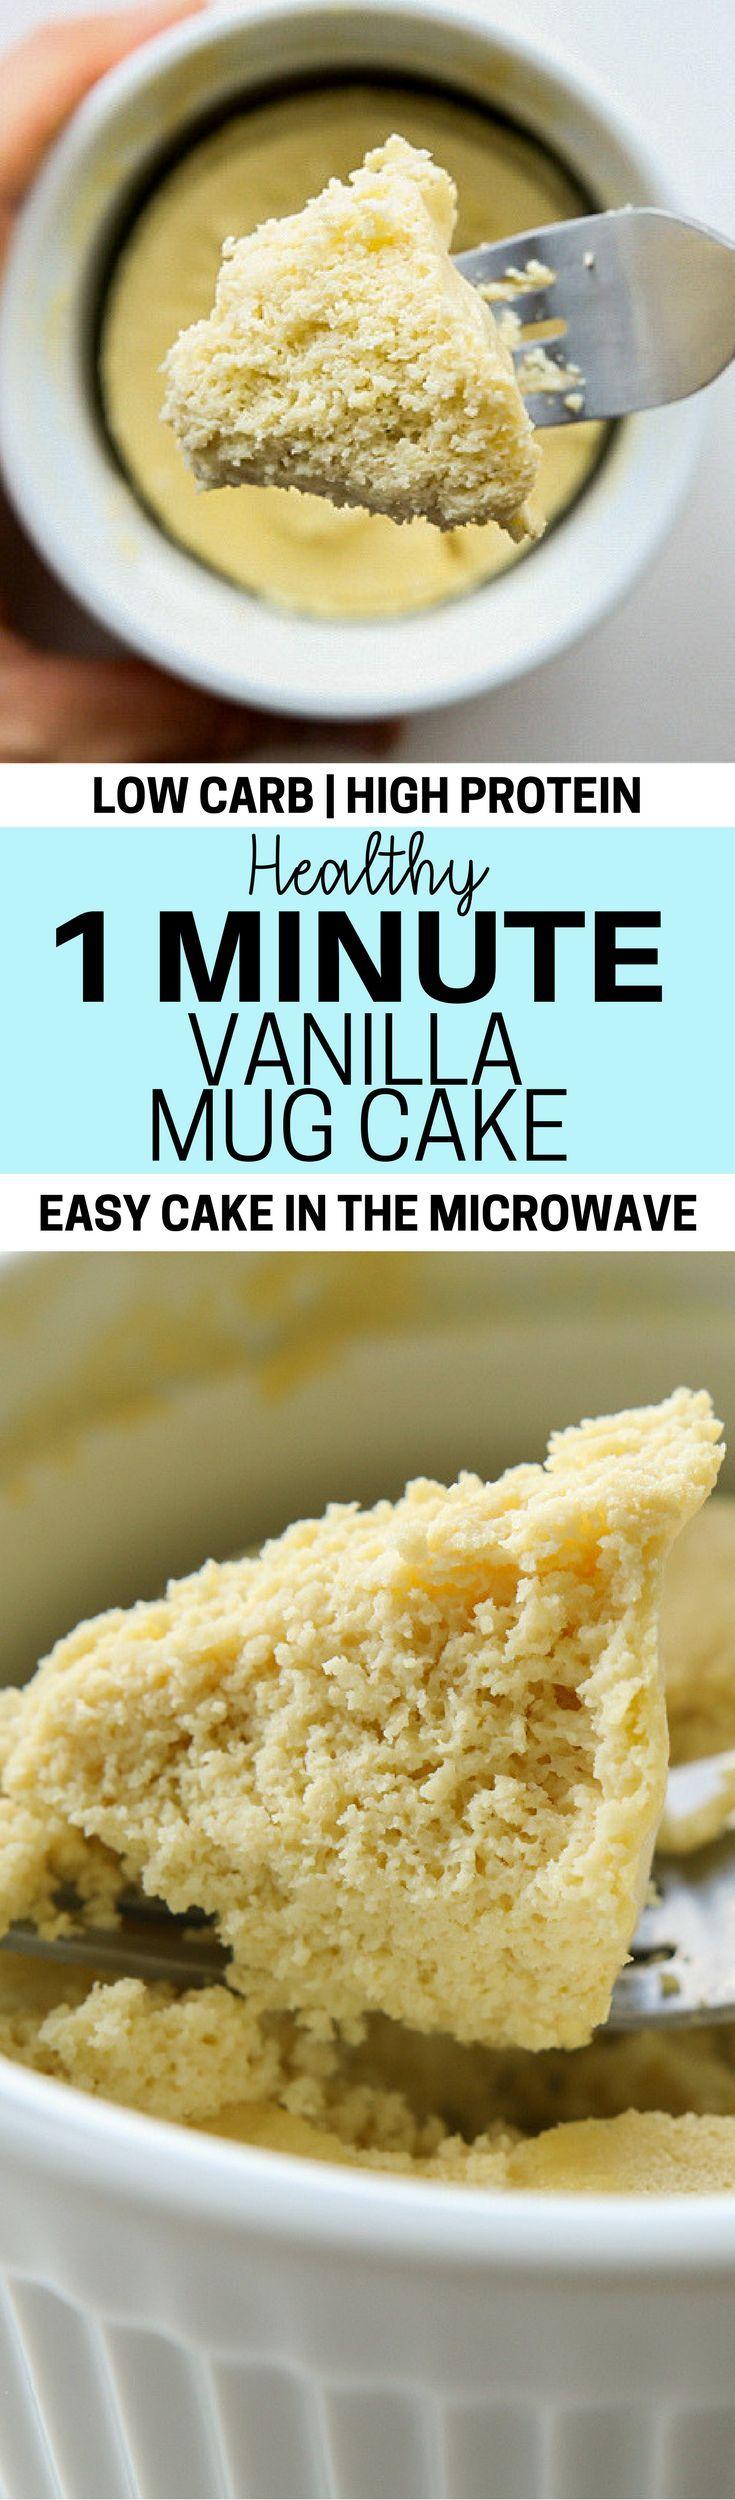 Healthy Low Carb Vanilla Mug Cake Recipe - The Diet Chef ...